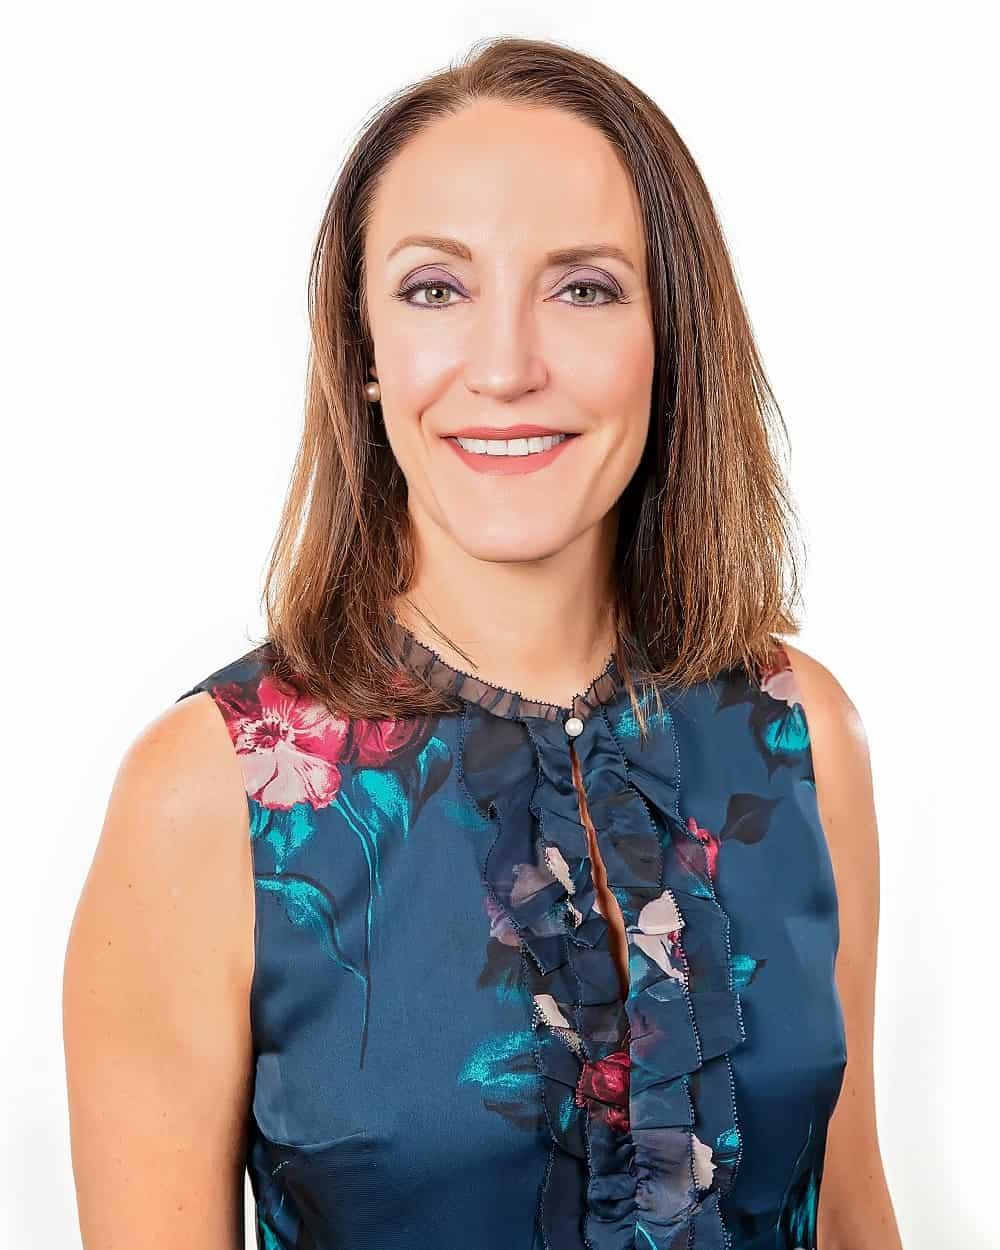 Danielle Roberts